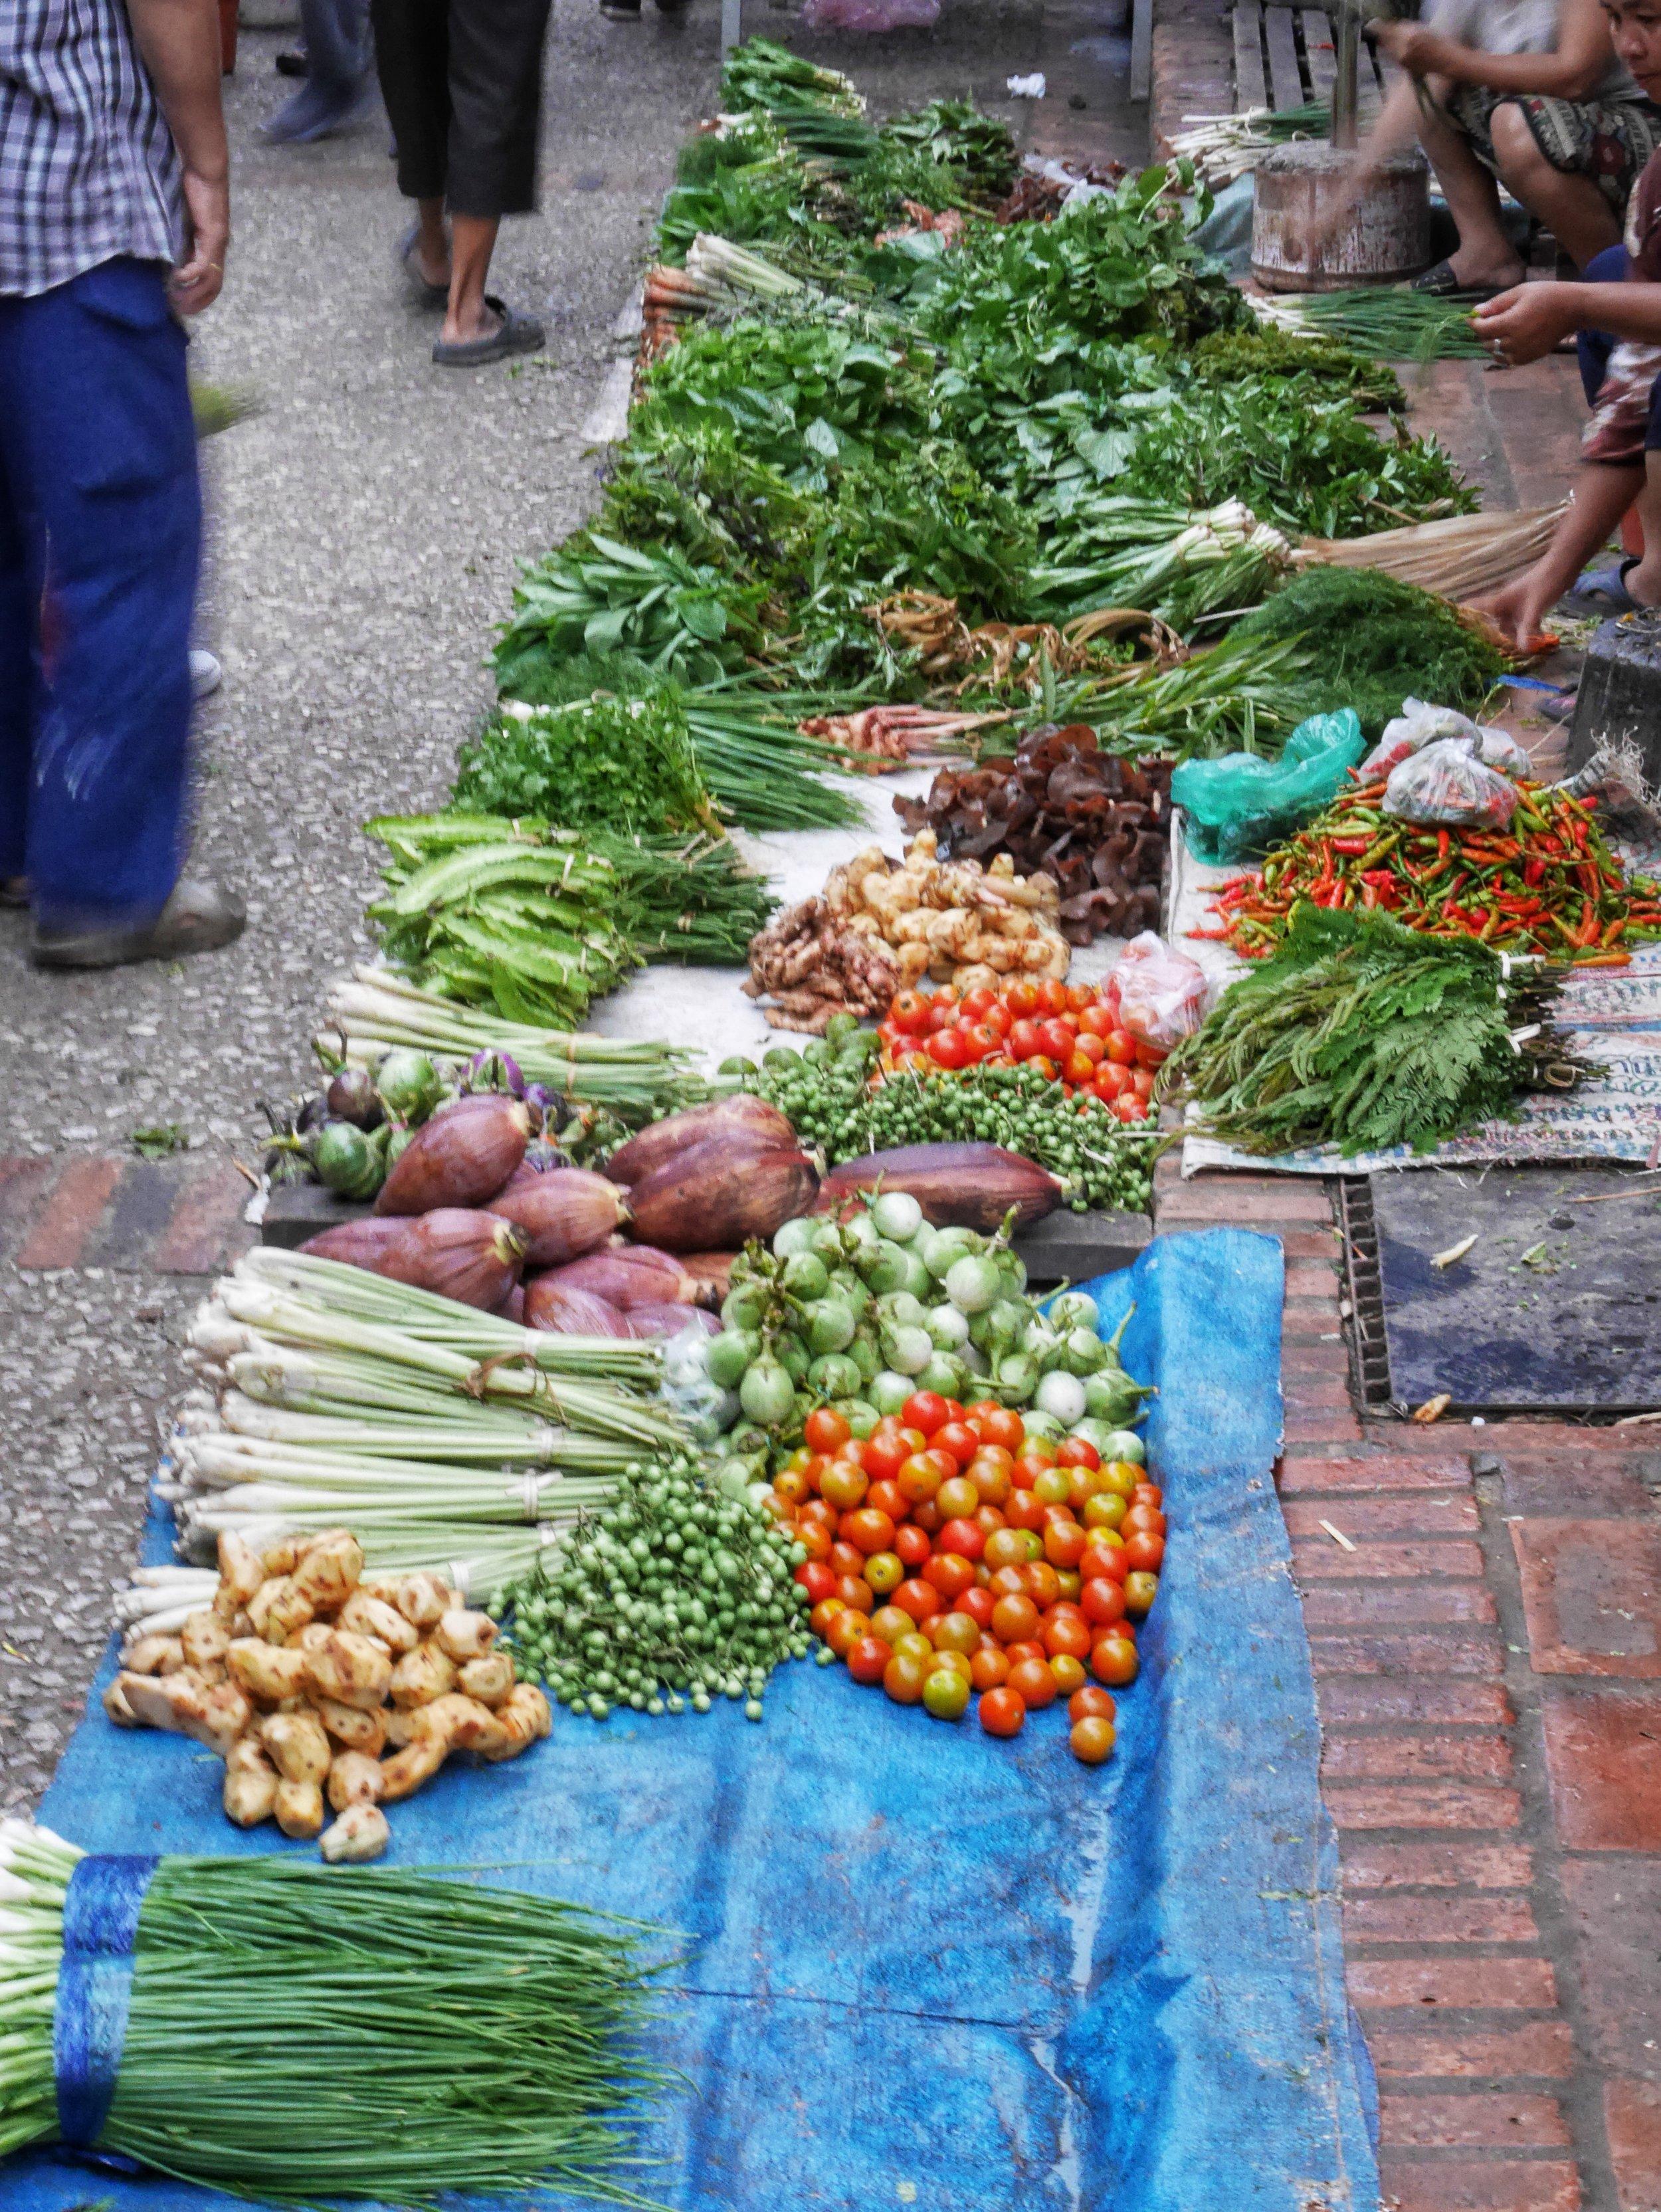 fresh produce for sale at the Morning Market in Luang Prabang, Laos